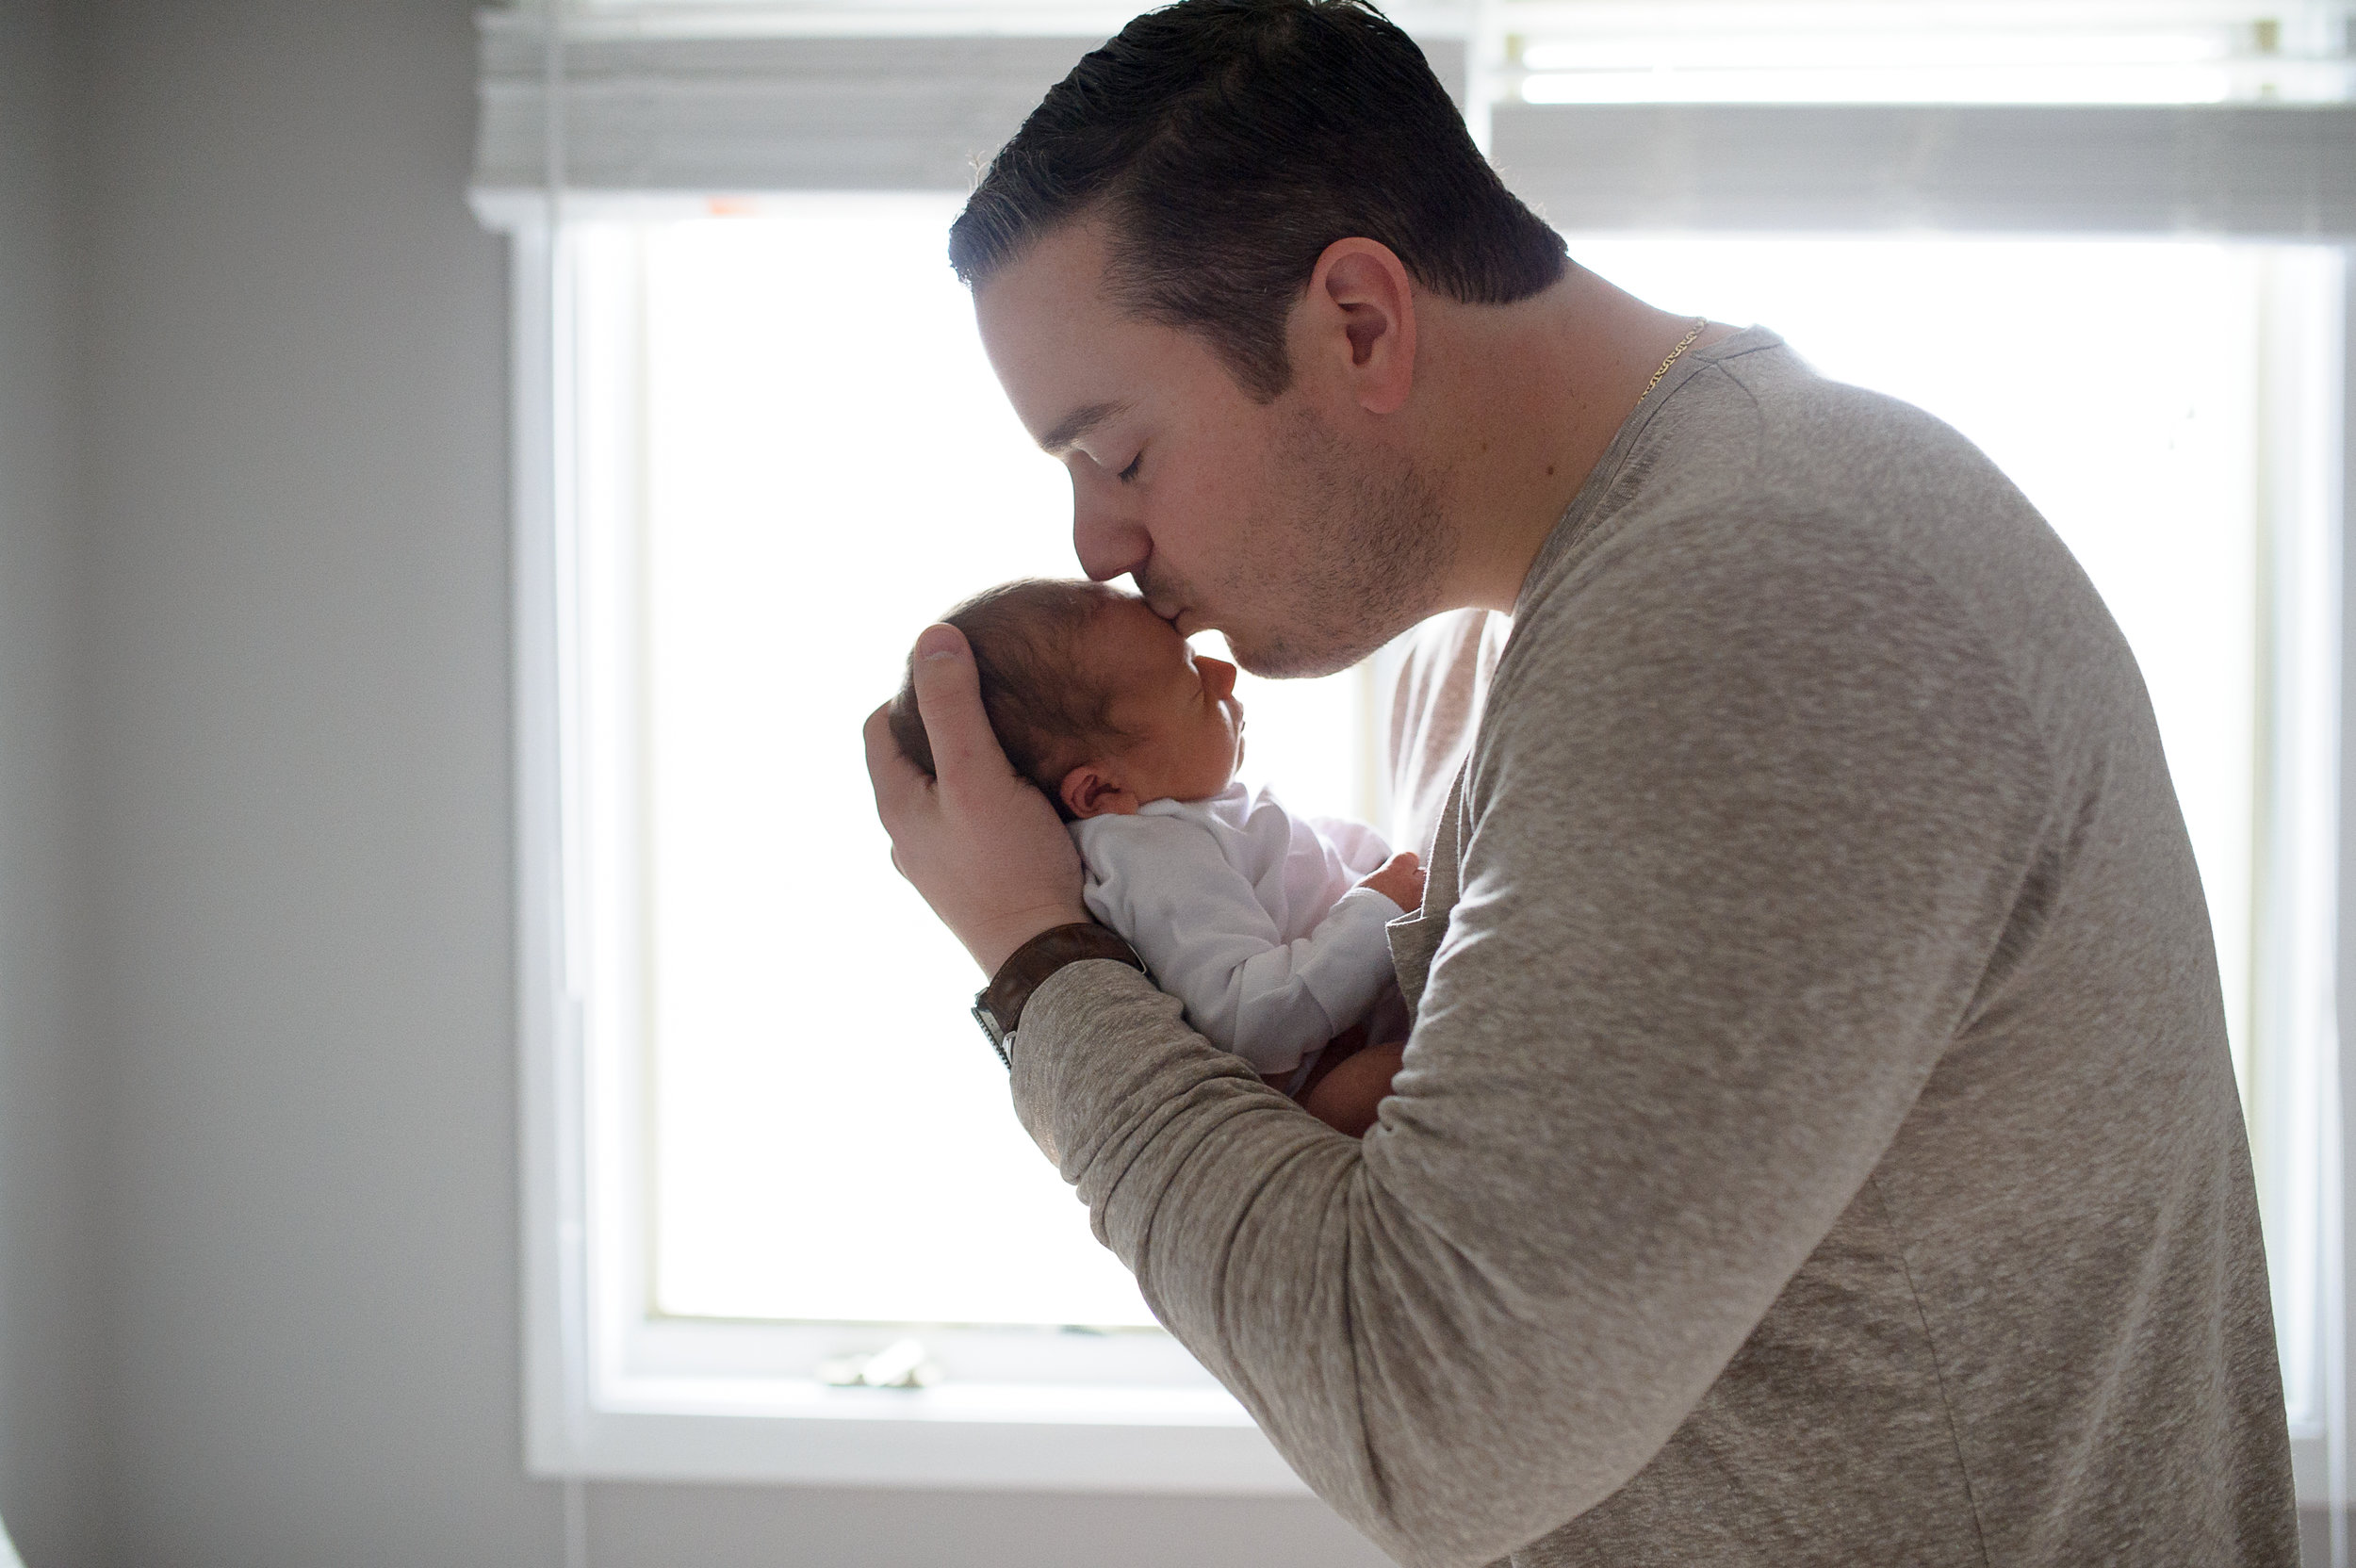 fatherhood, father with newborn son, bergen county newborn photographer, natasha chiaviello photography